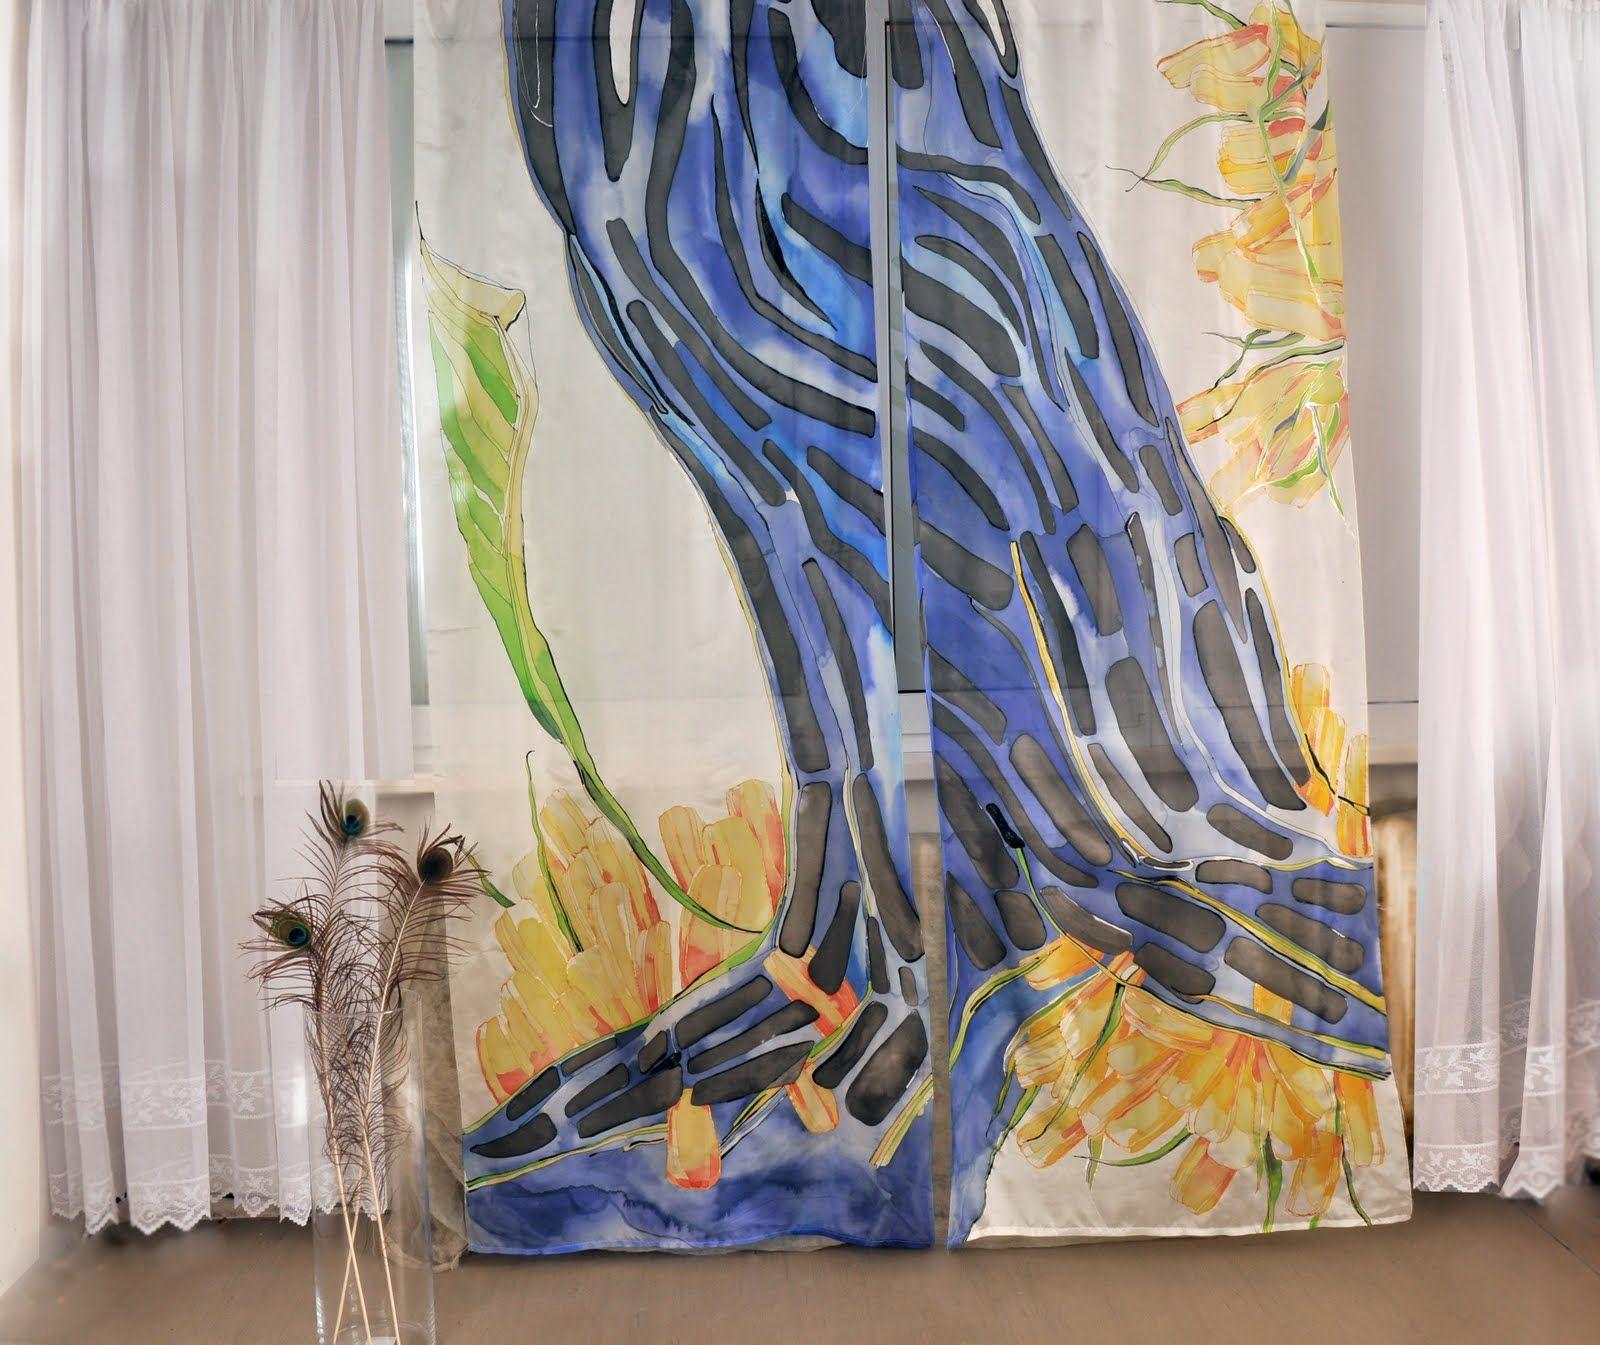 clematis diy curtains faux at departments velvet l prd curtain b header w lined q silk bq cm eyelet arcadia